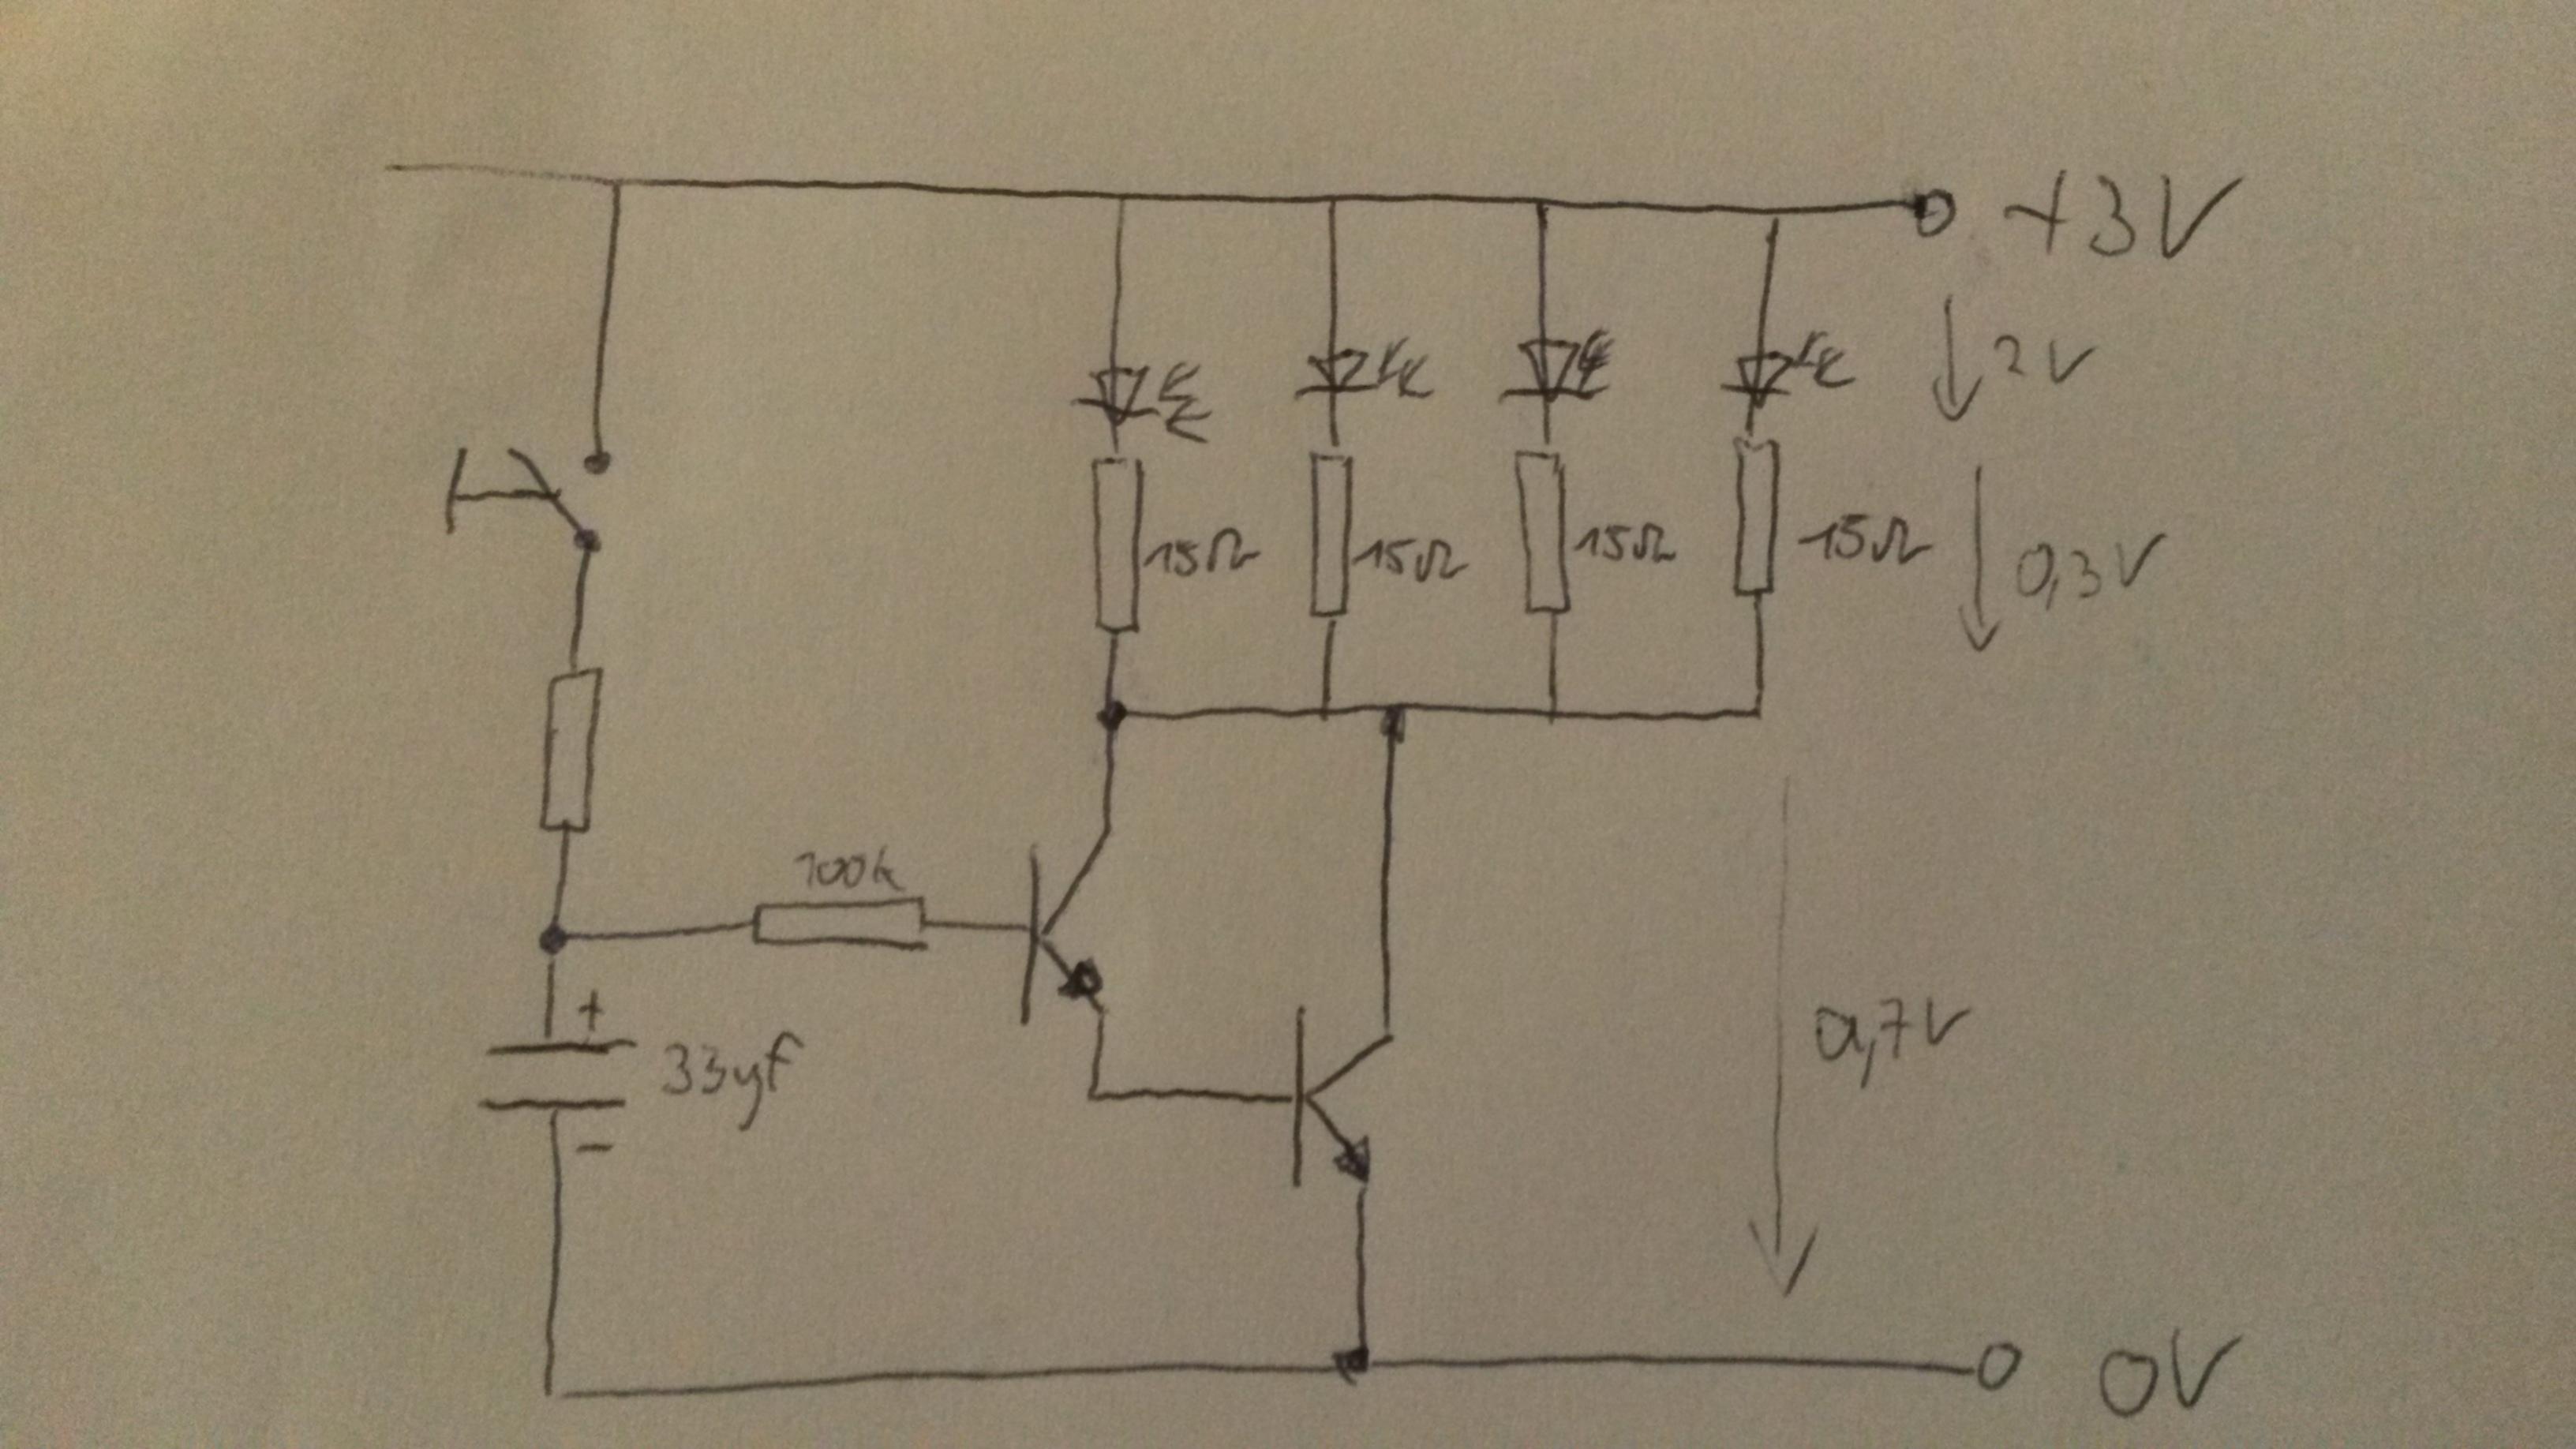 led zeitverz gerungsschaltung elektronik schaltung. Black Bedroom Furniture Sets. Home Design Ideas